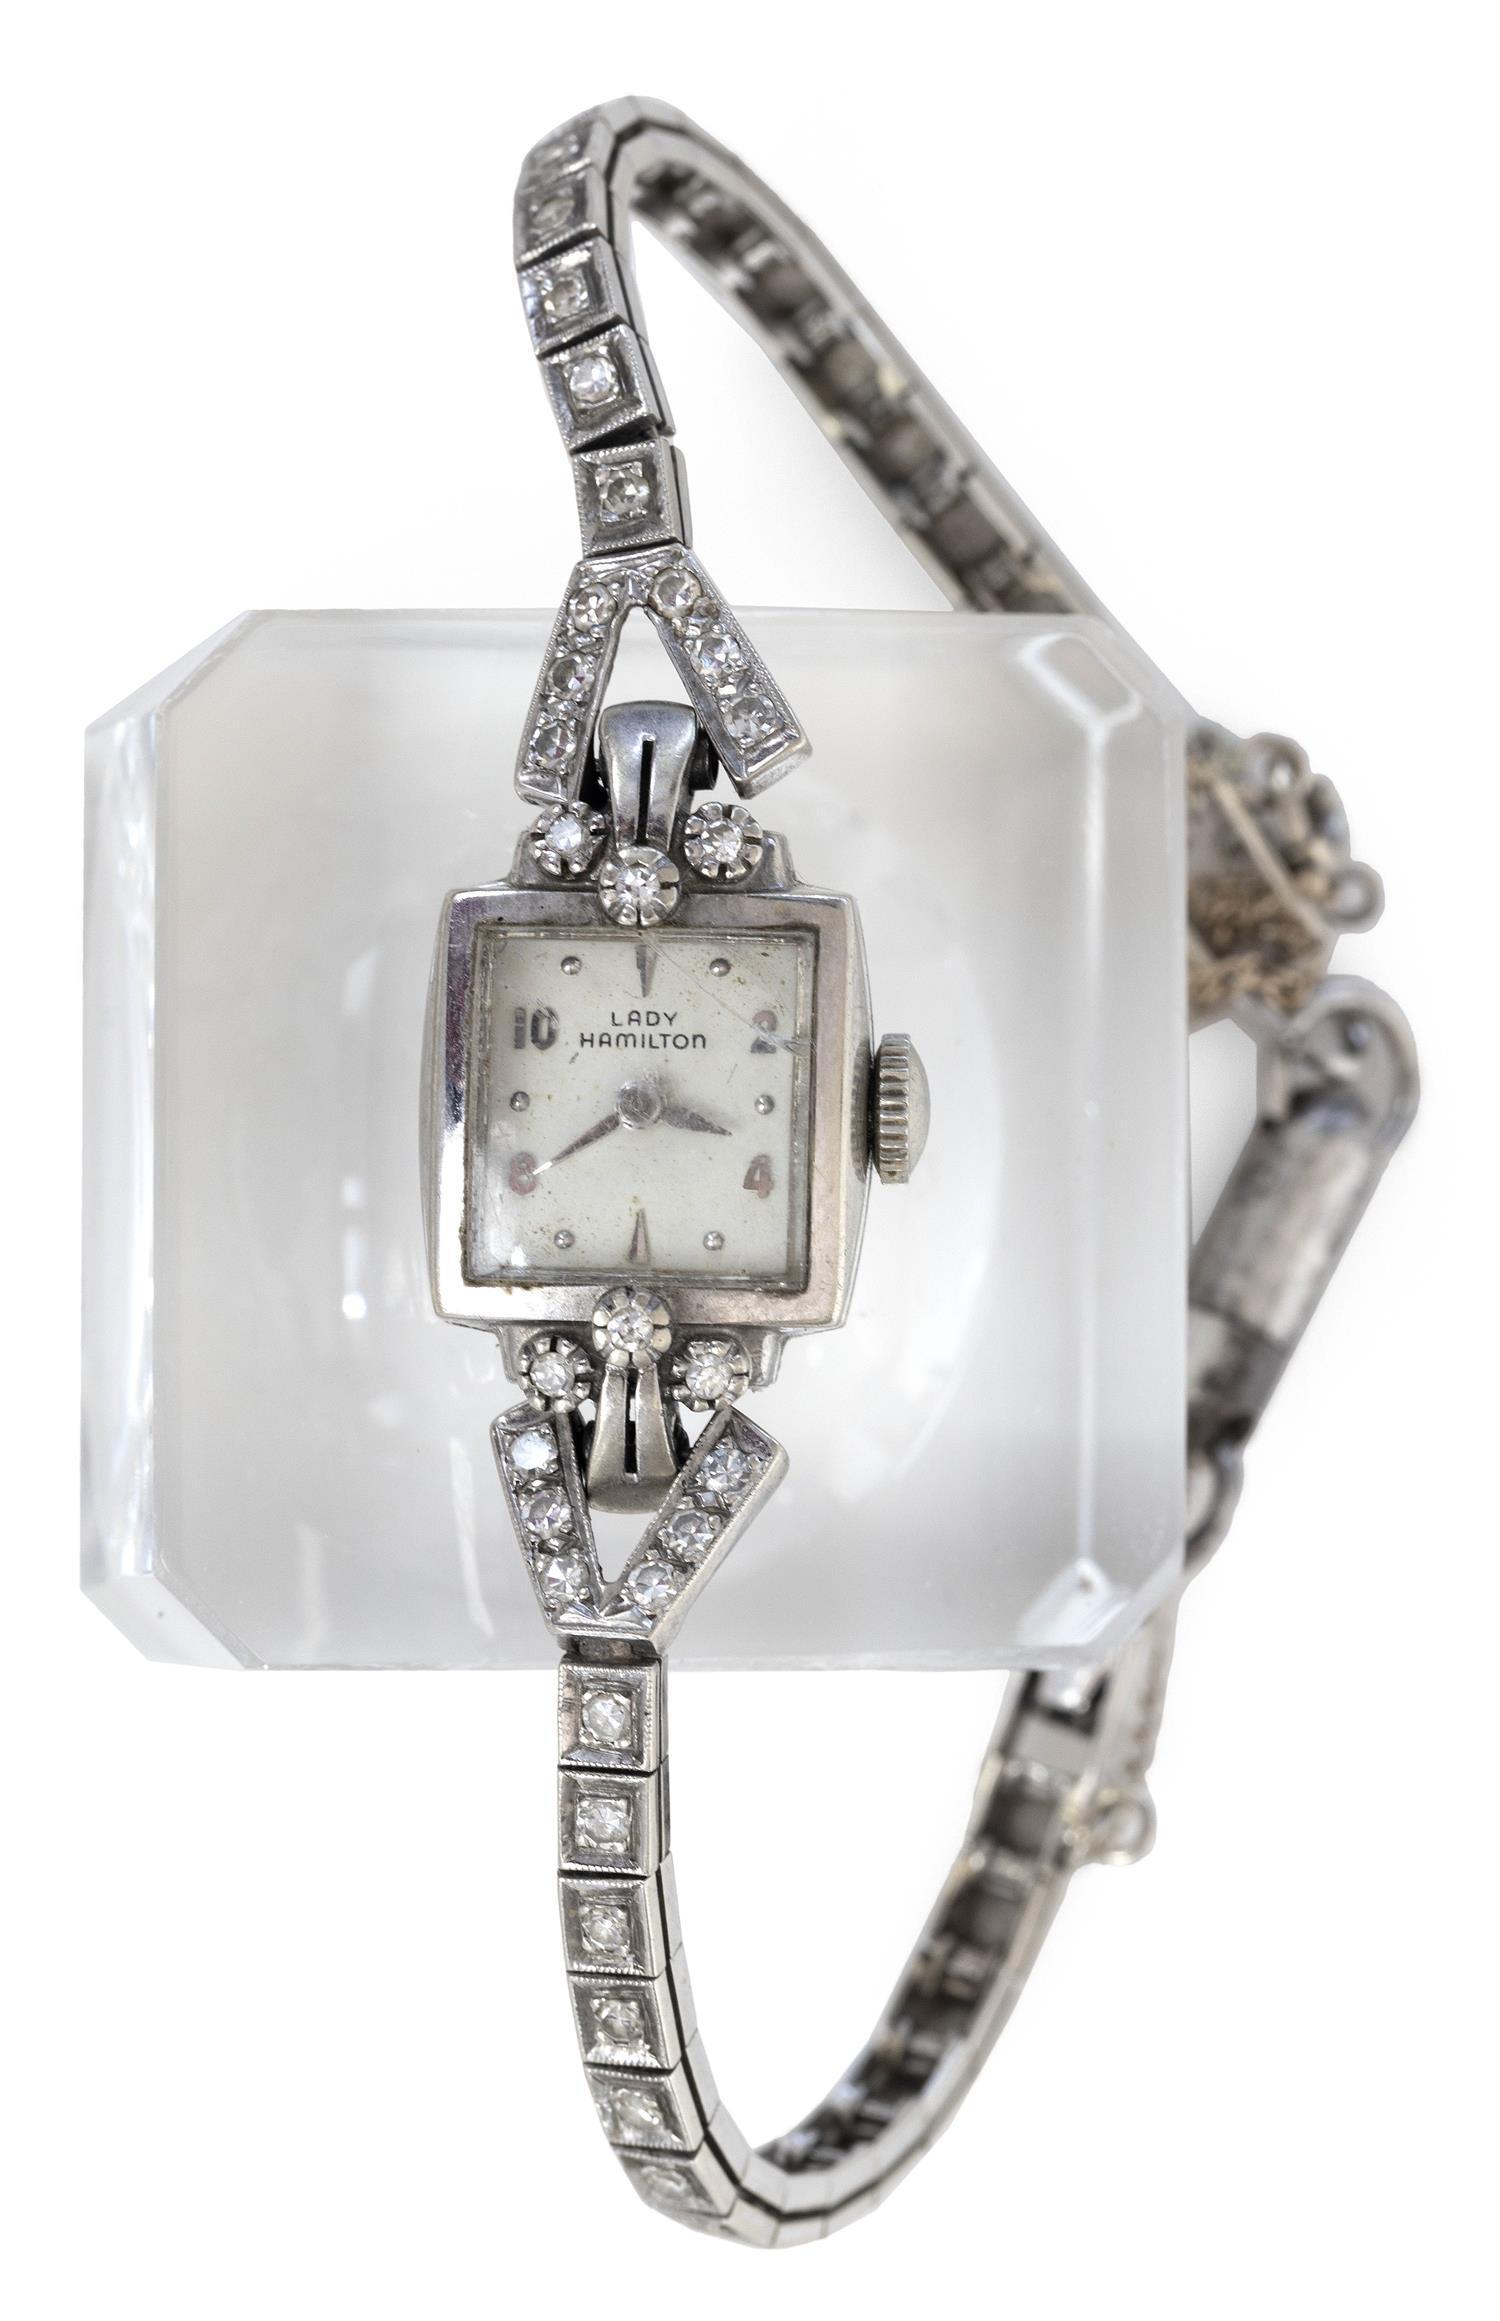 HAMILTON 14KT WHITE GOLD AND DIAMOND LADY'S WRIST WATCH Square case. Lugs and bracelet set with 32 small diamonds.